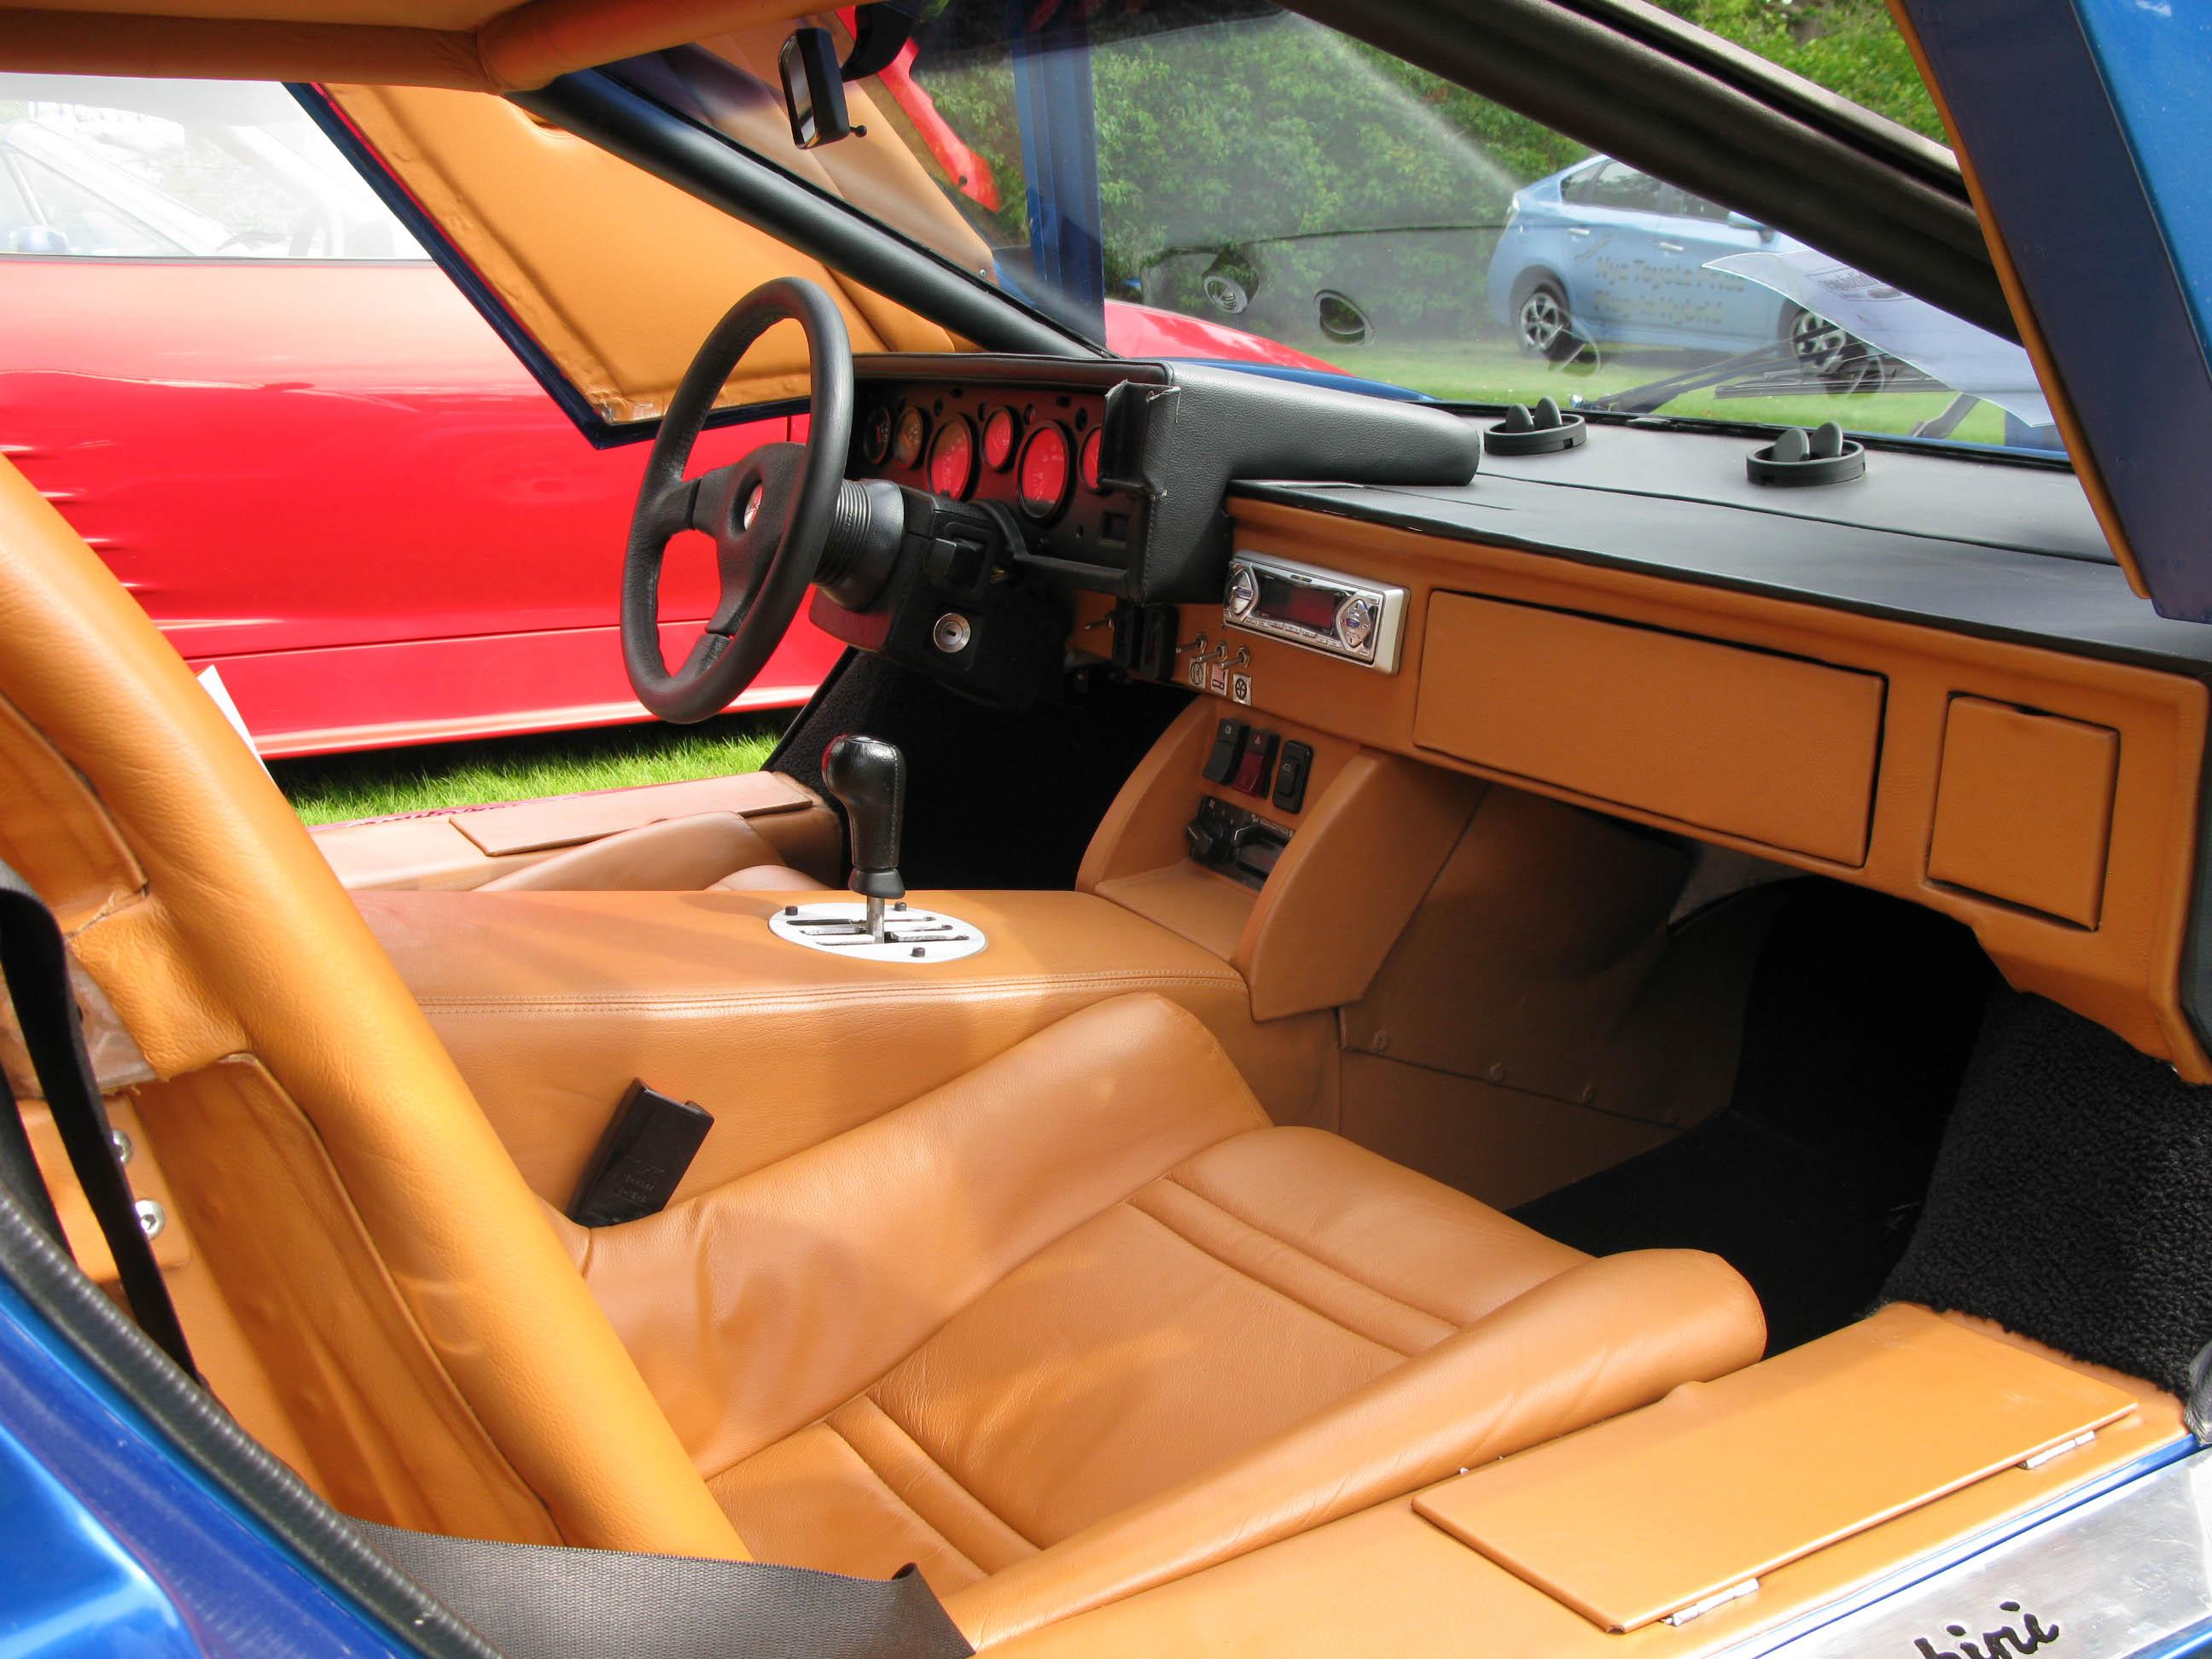 Lamborghini_Countach_interior.jpg